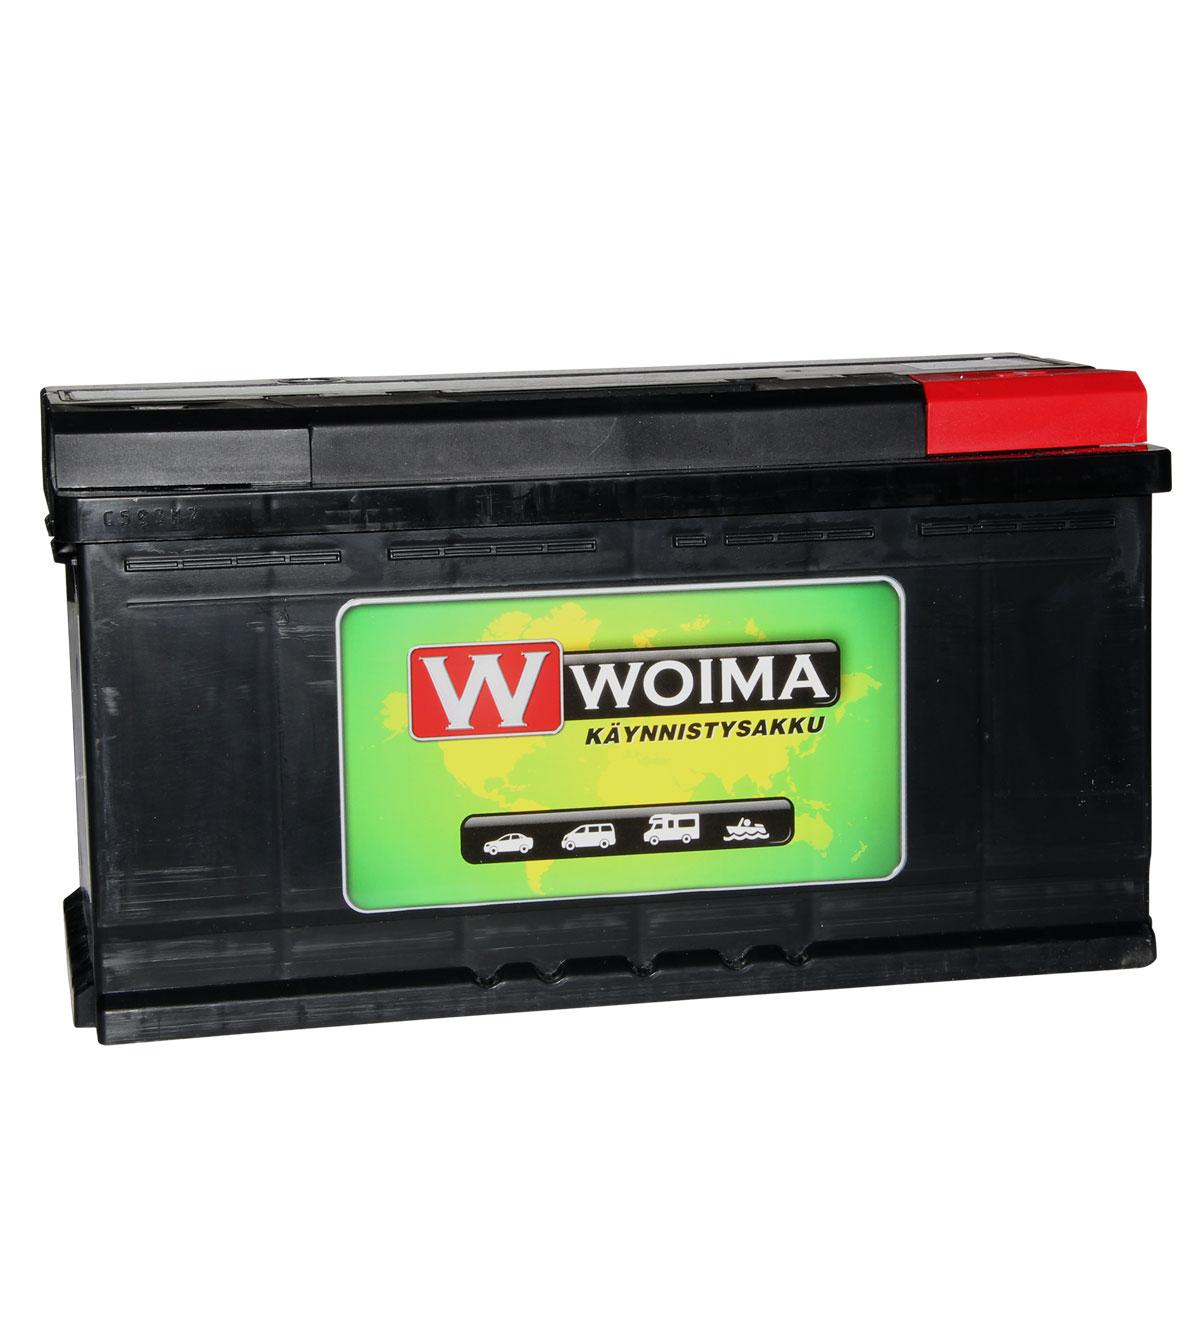 Woima 100Ah 835A 353x175x190mm -/+ käynnistysakku